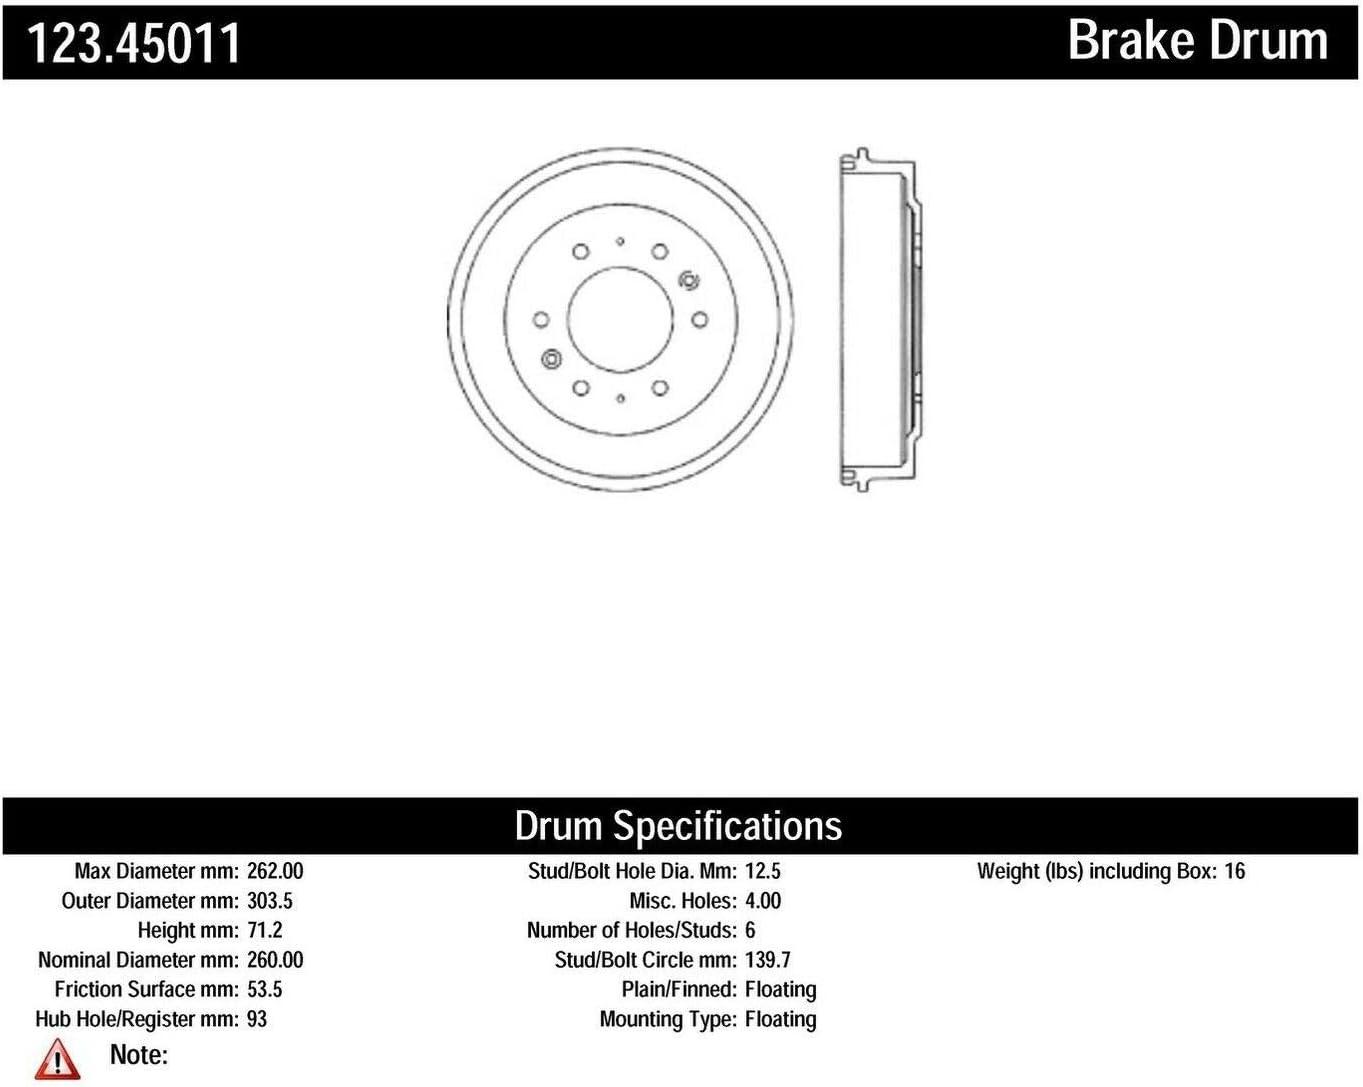 High quality Centric Parts 123.45011 Brake Drum List price